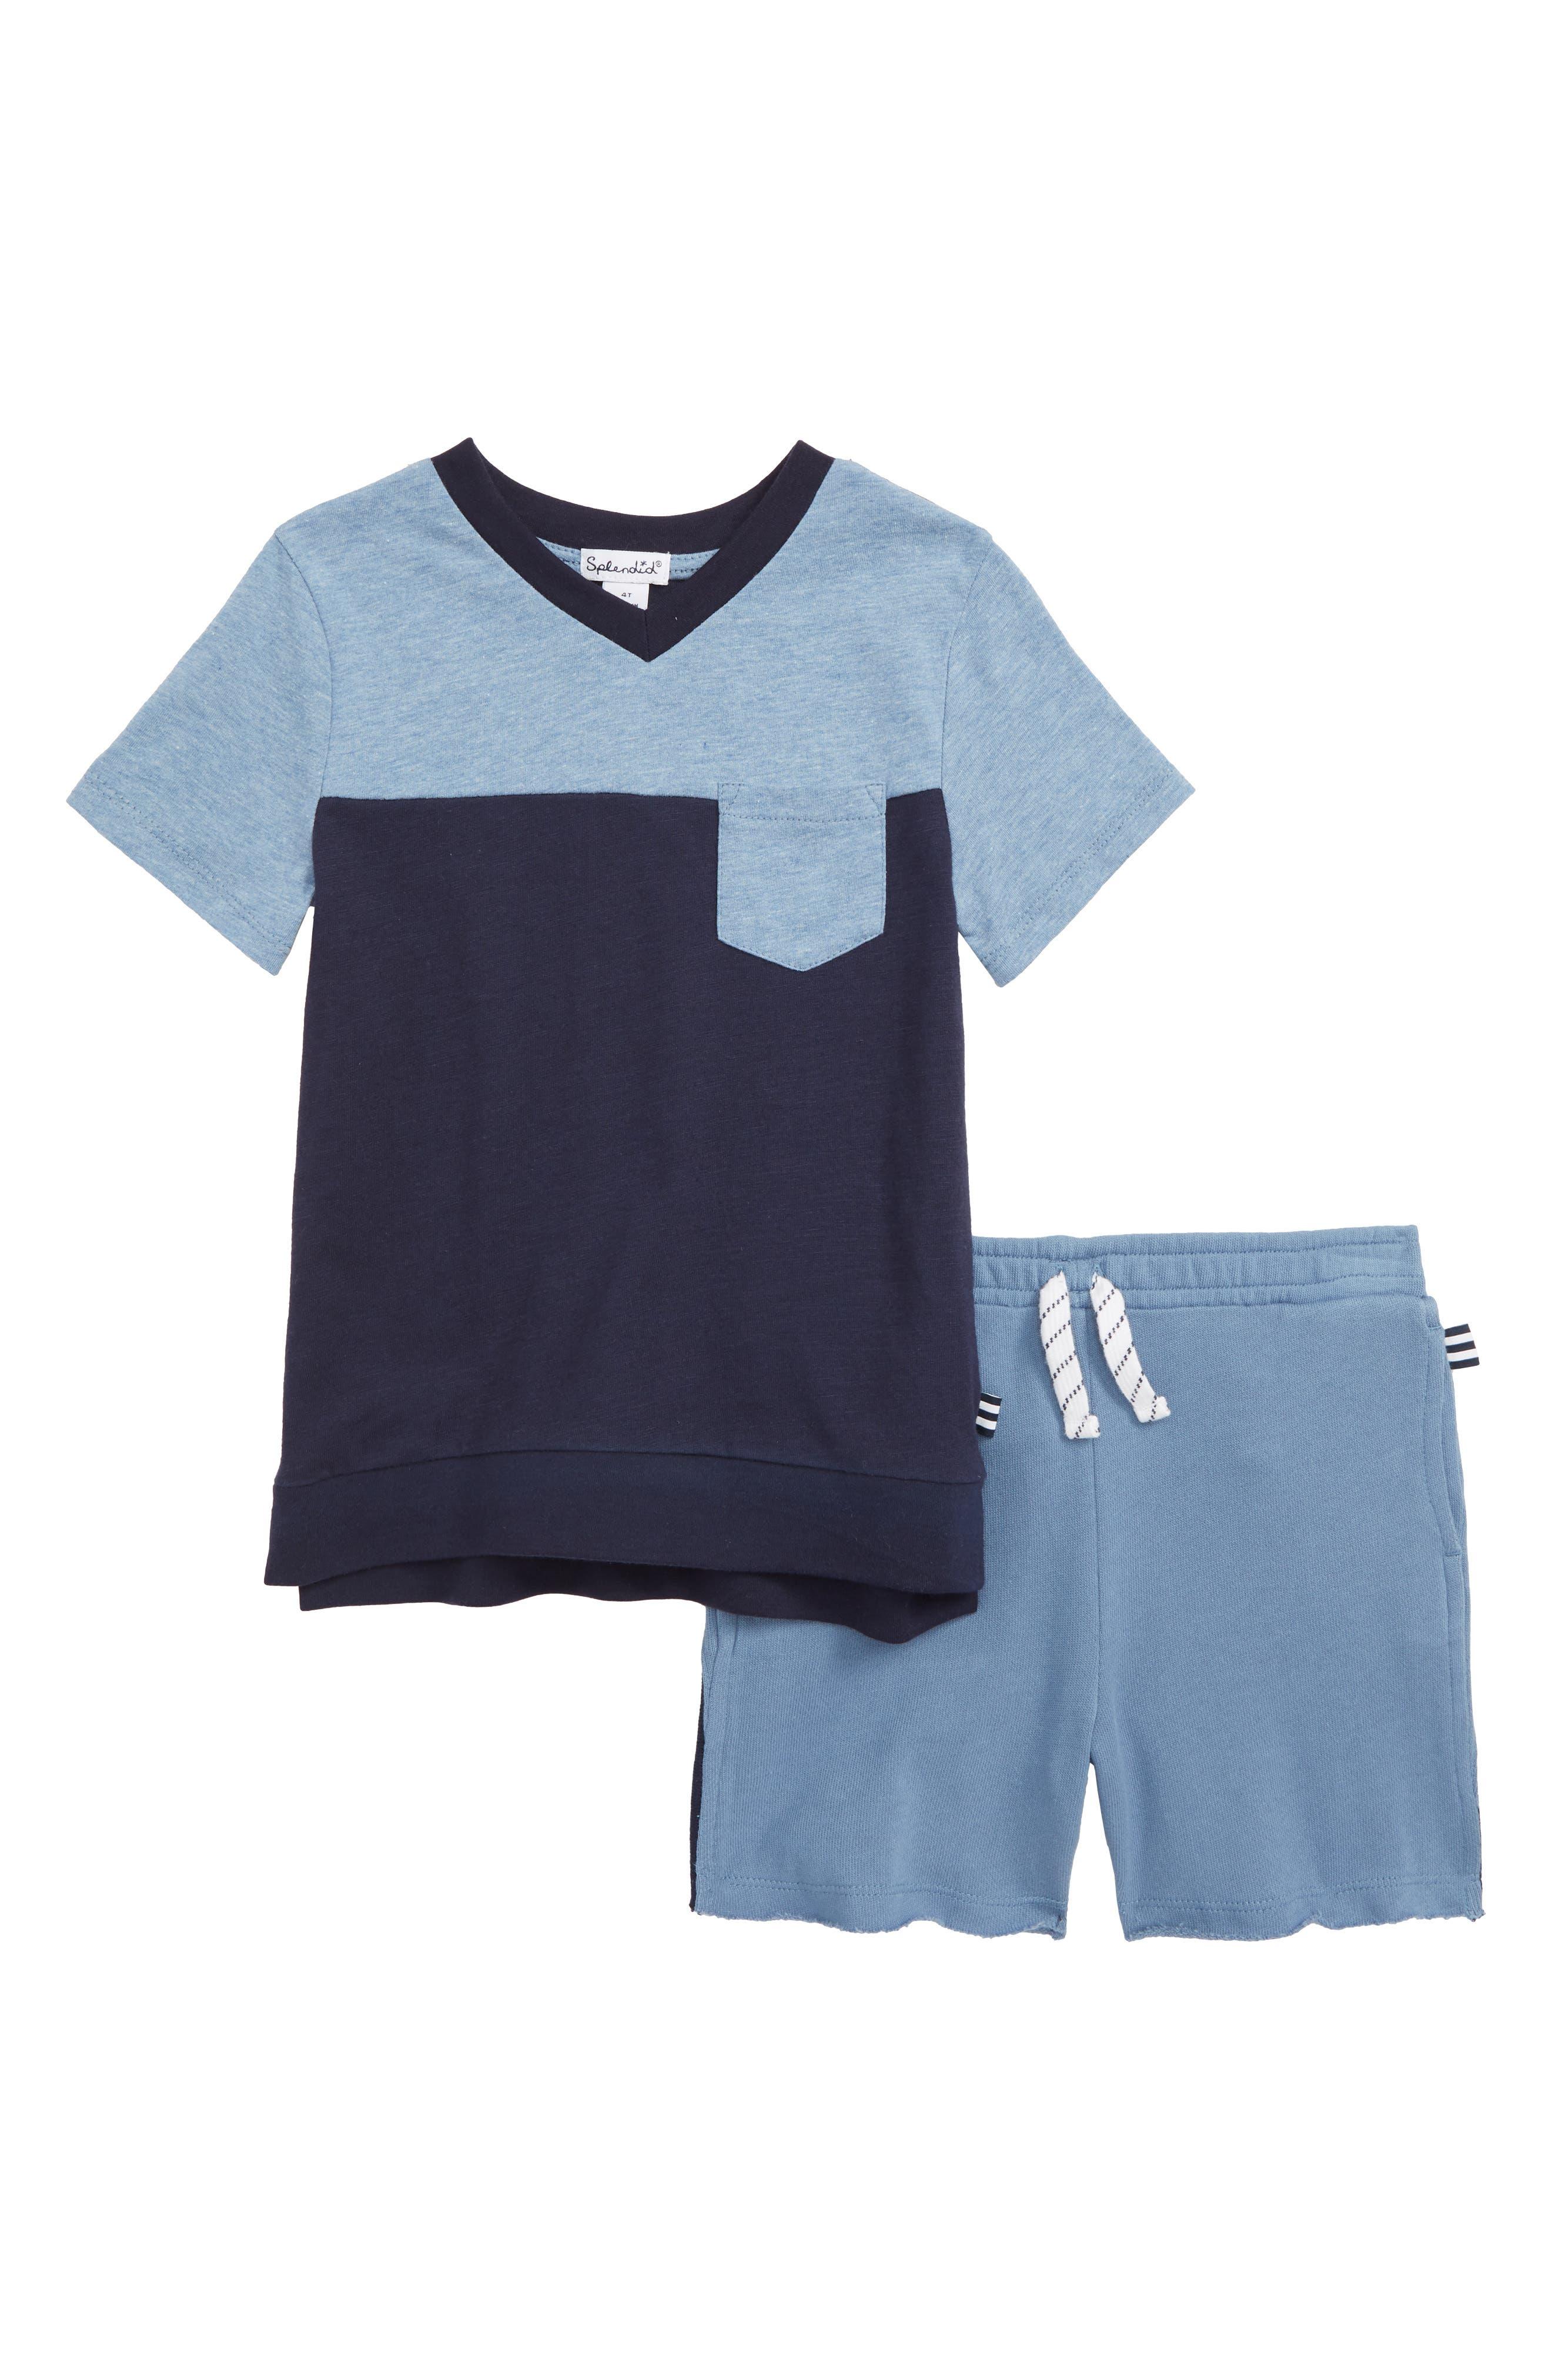 Boys Splendid Colorblock TShirt  Racing Stripe Shorts Set